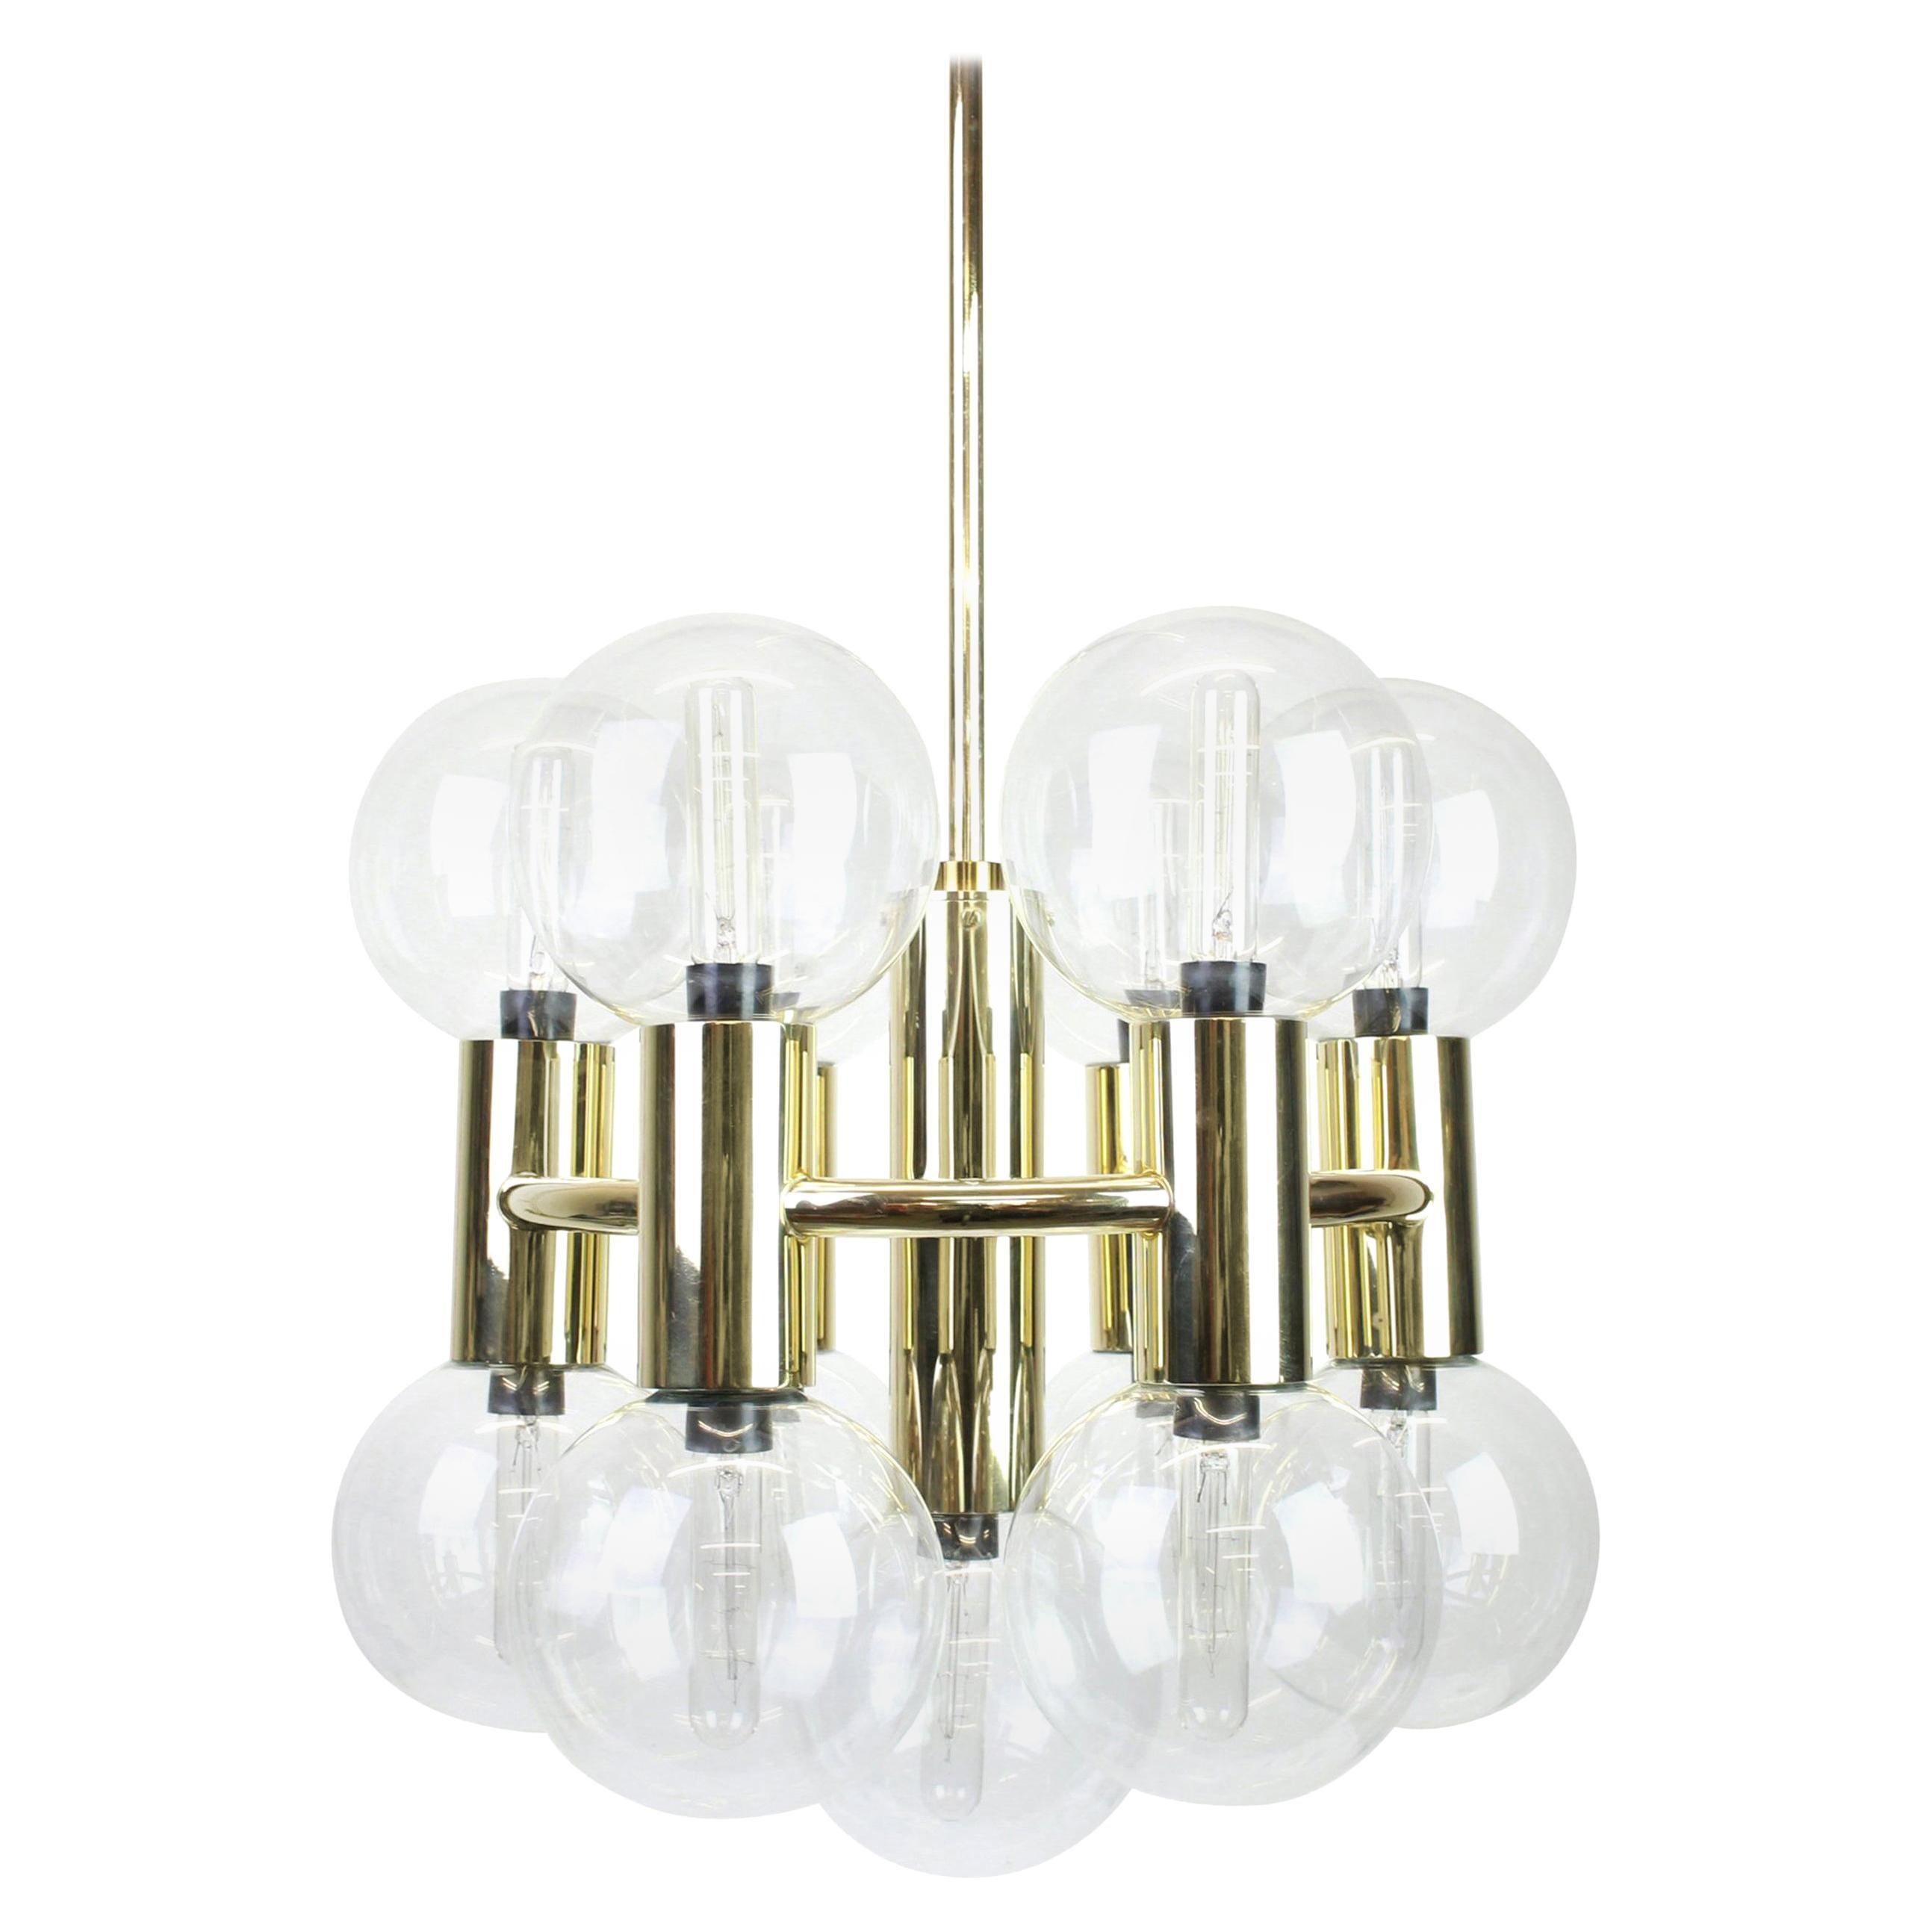 Sputnik Brass Chandelier Design by Motoko Ishii for Staff, Germany, 1970s